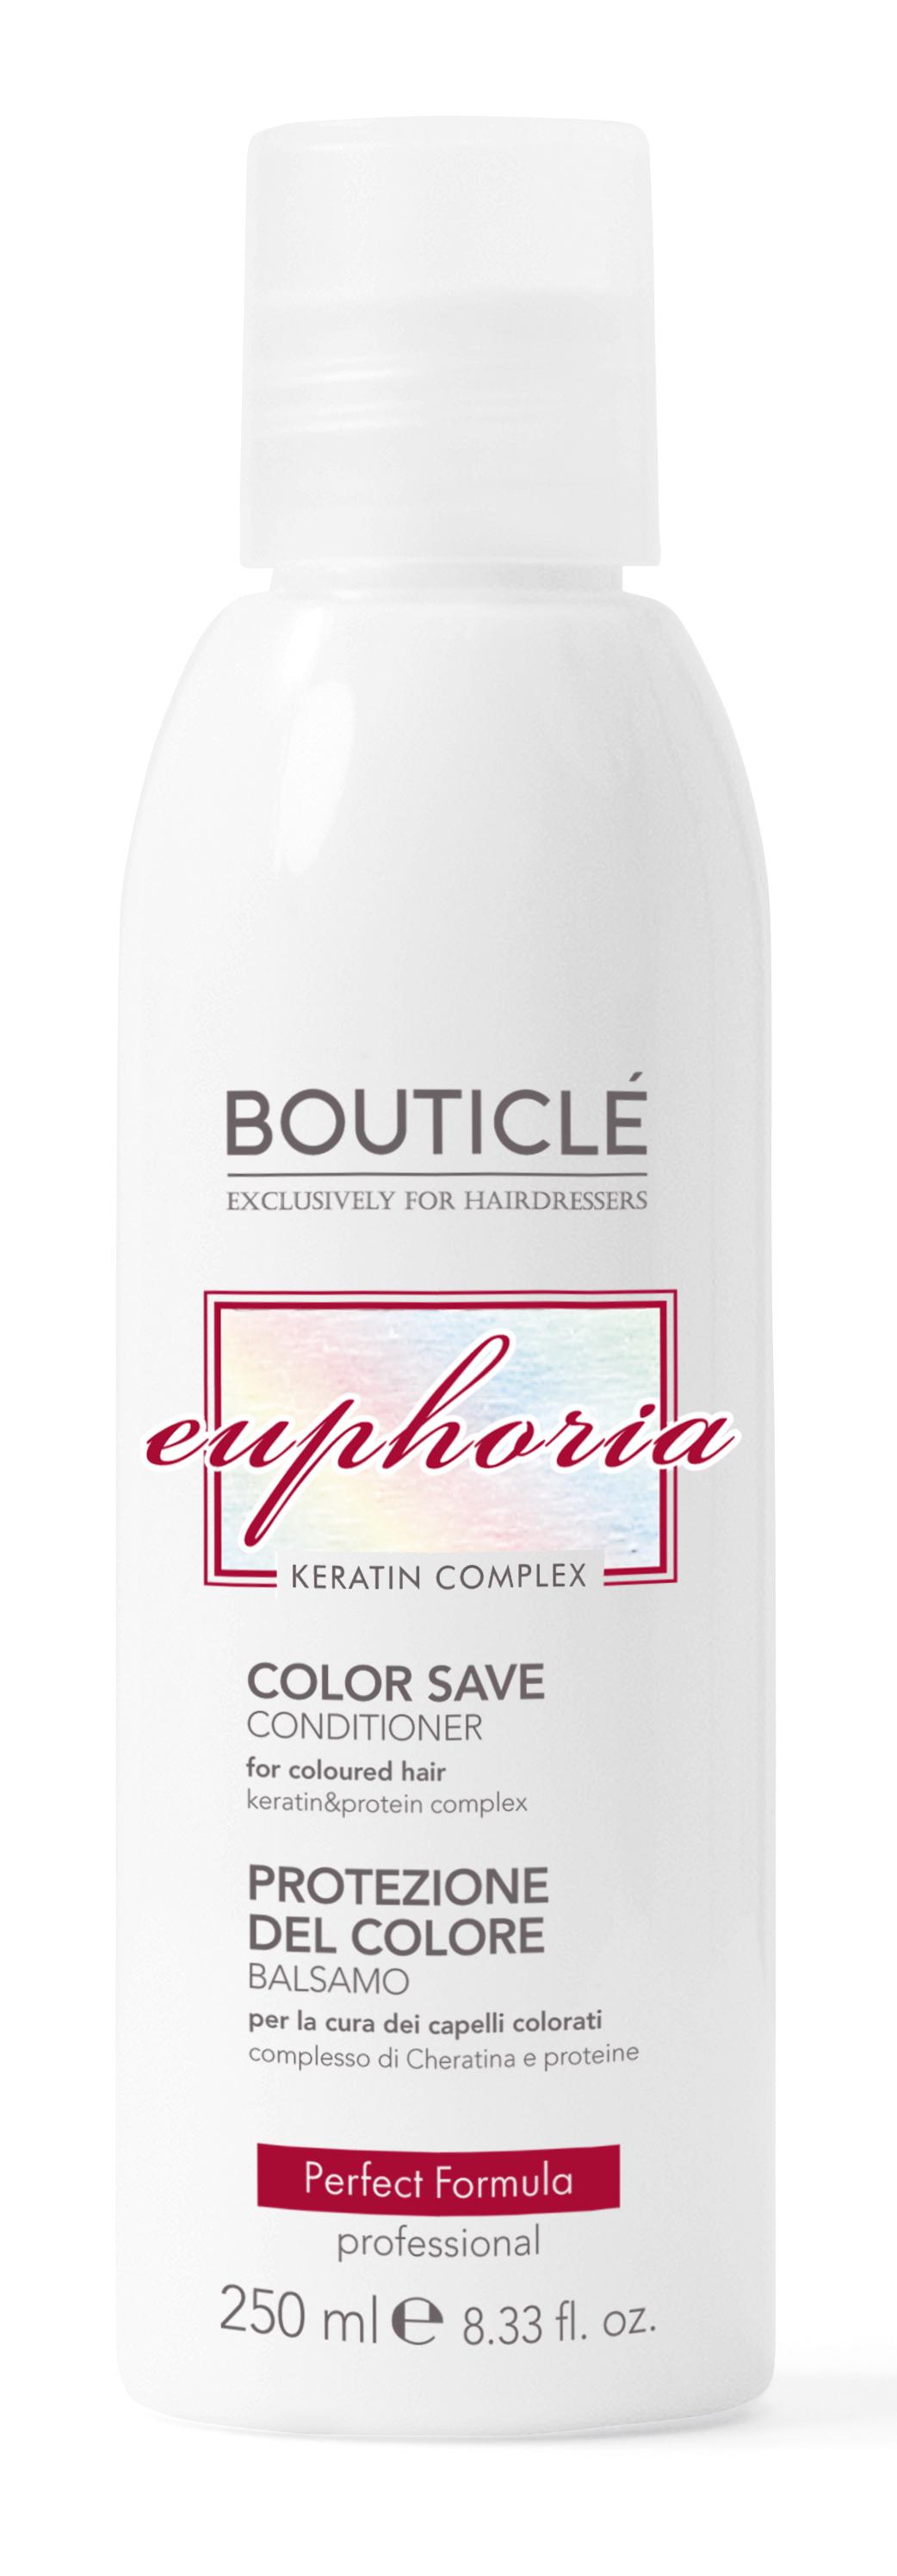 BOUTICLE Кондиционер с Keratin & Protein Complex для окрашенных волос / Color Save Conditioner 250 мл